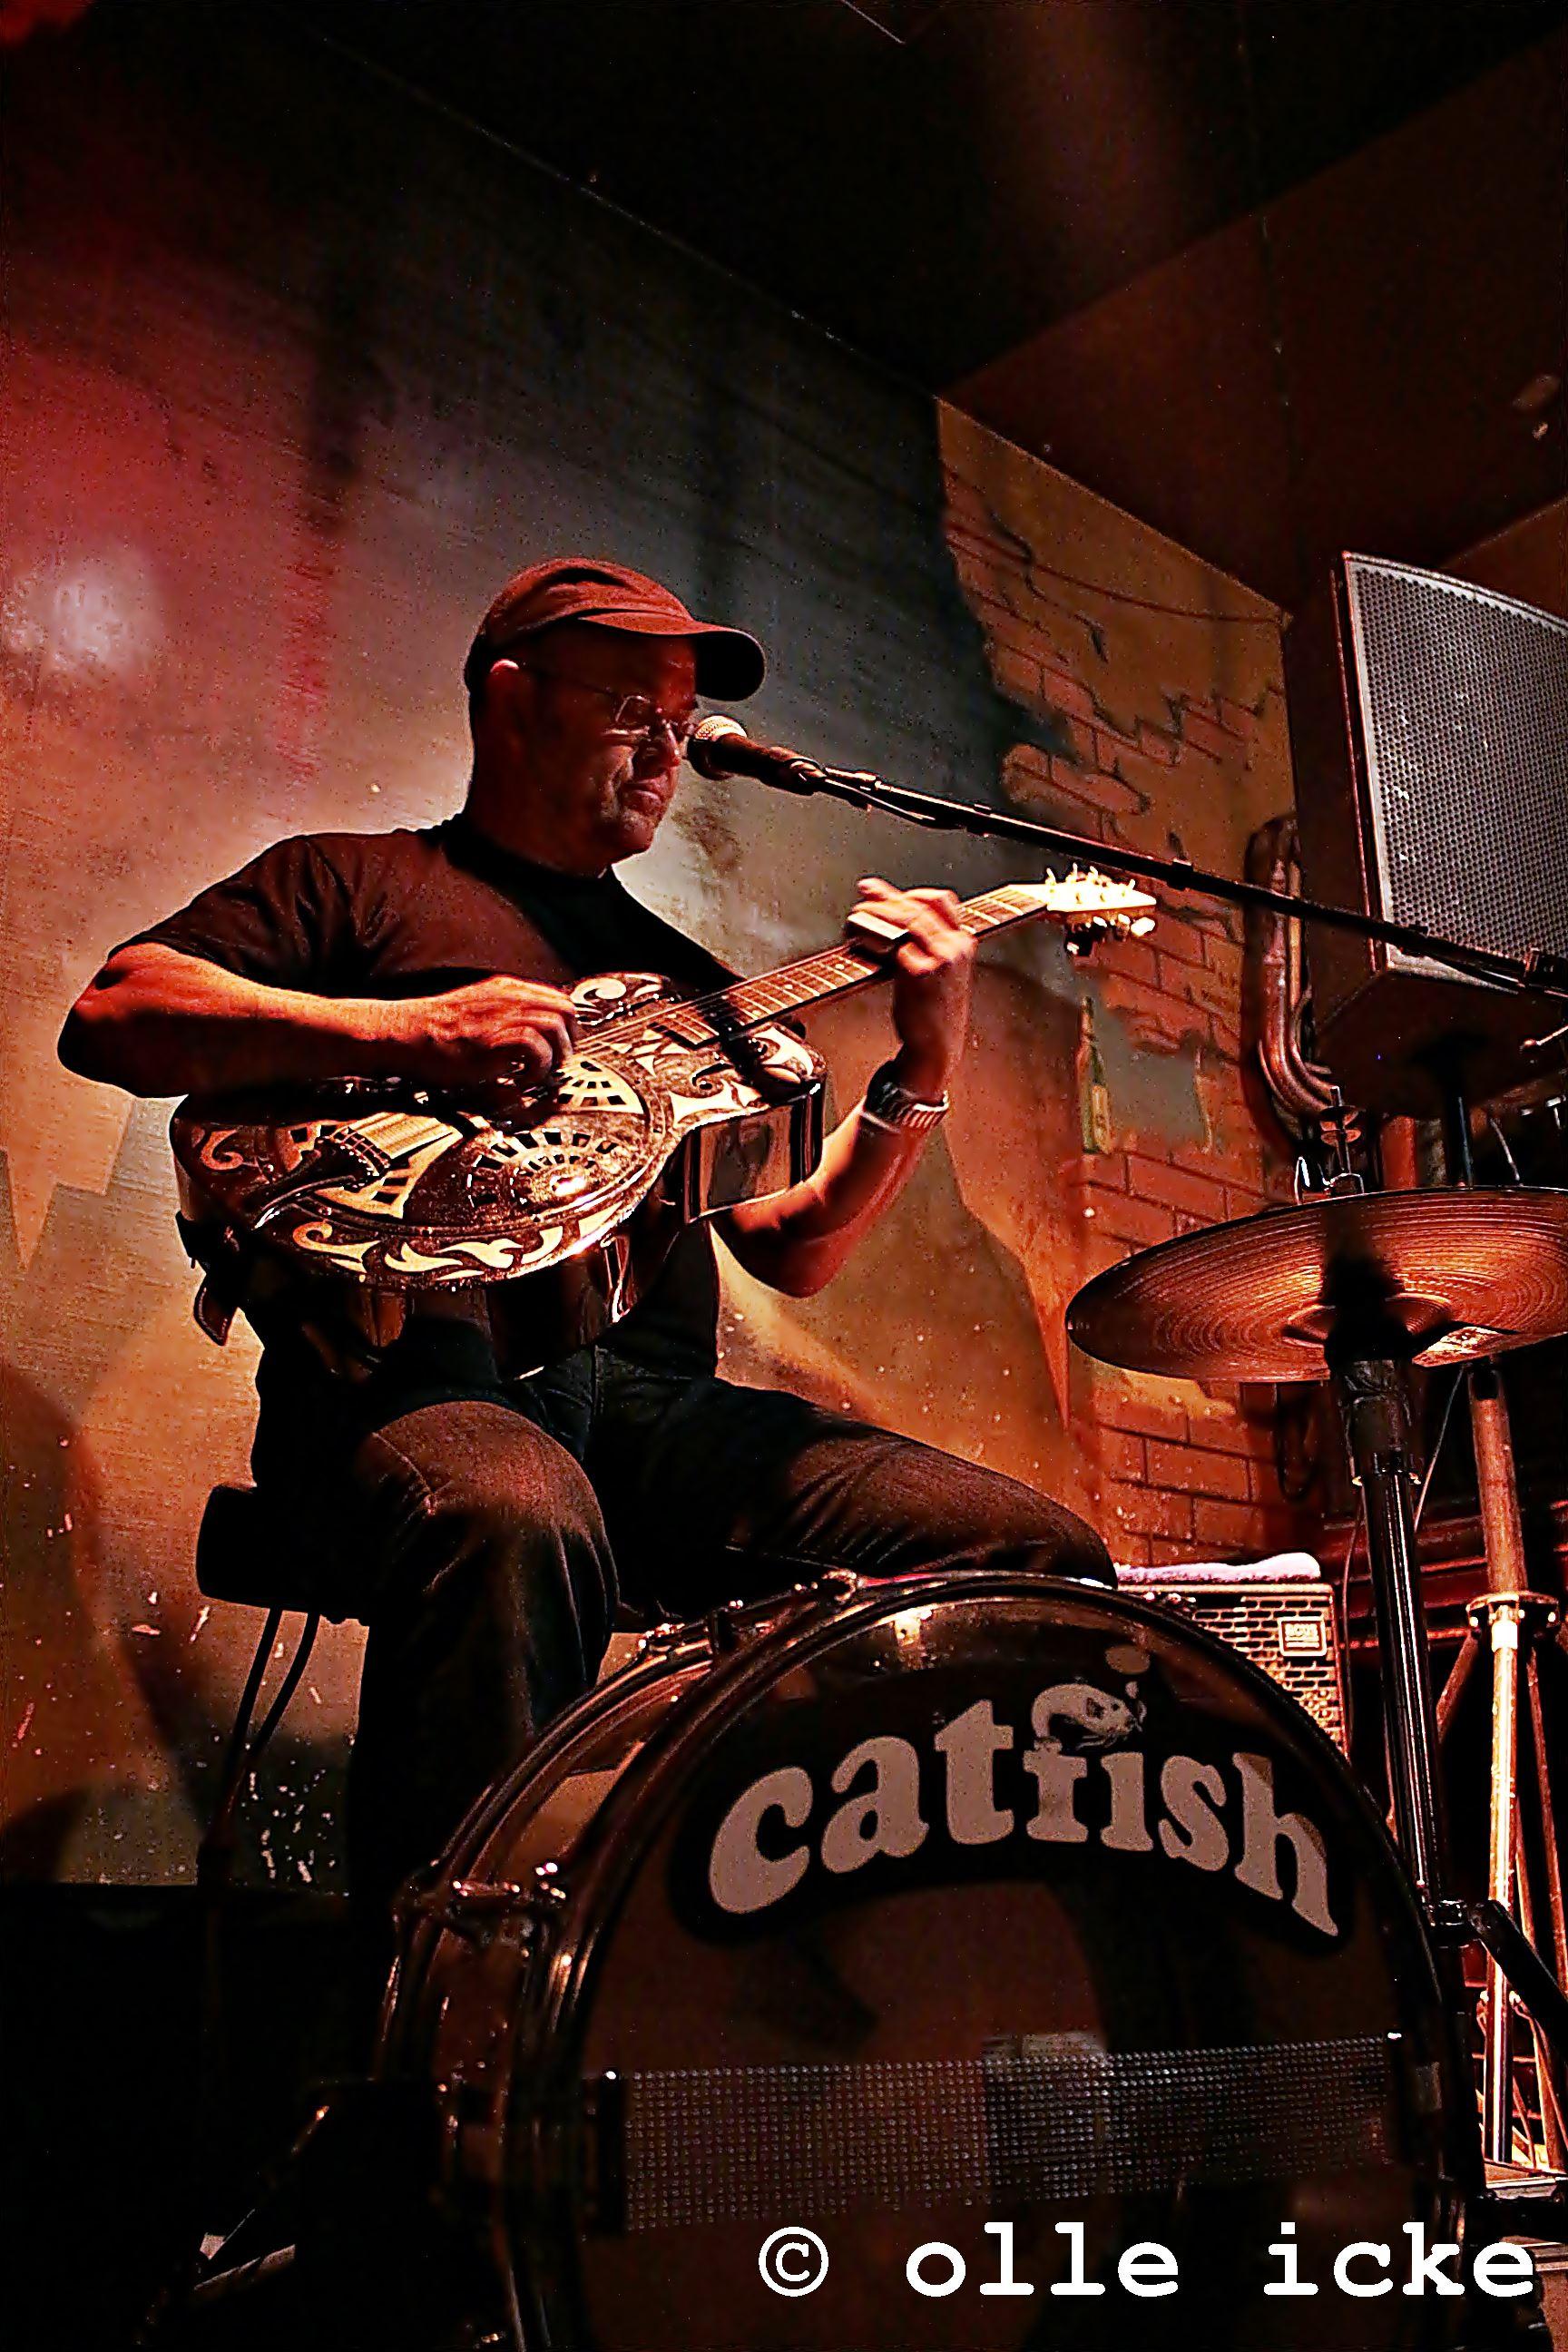 catfish - one man band - blues & rock\'n\'roll - Kulturcafe M - die ...